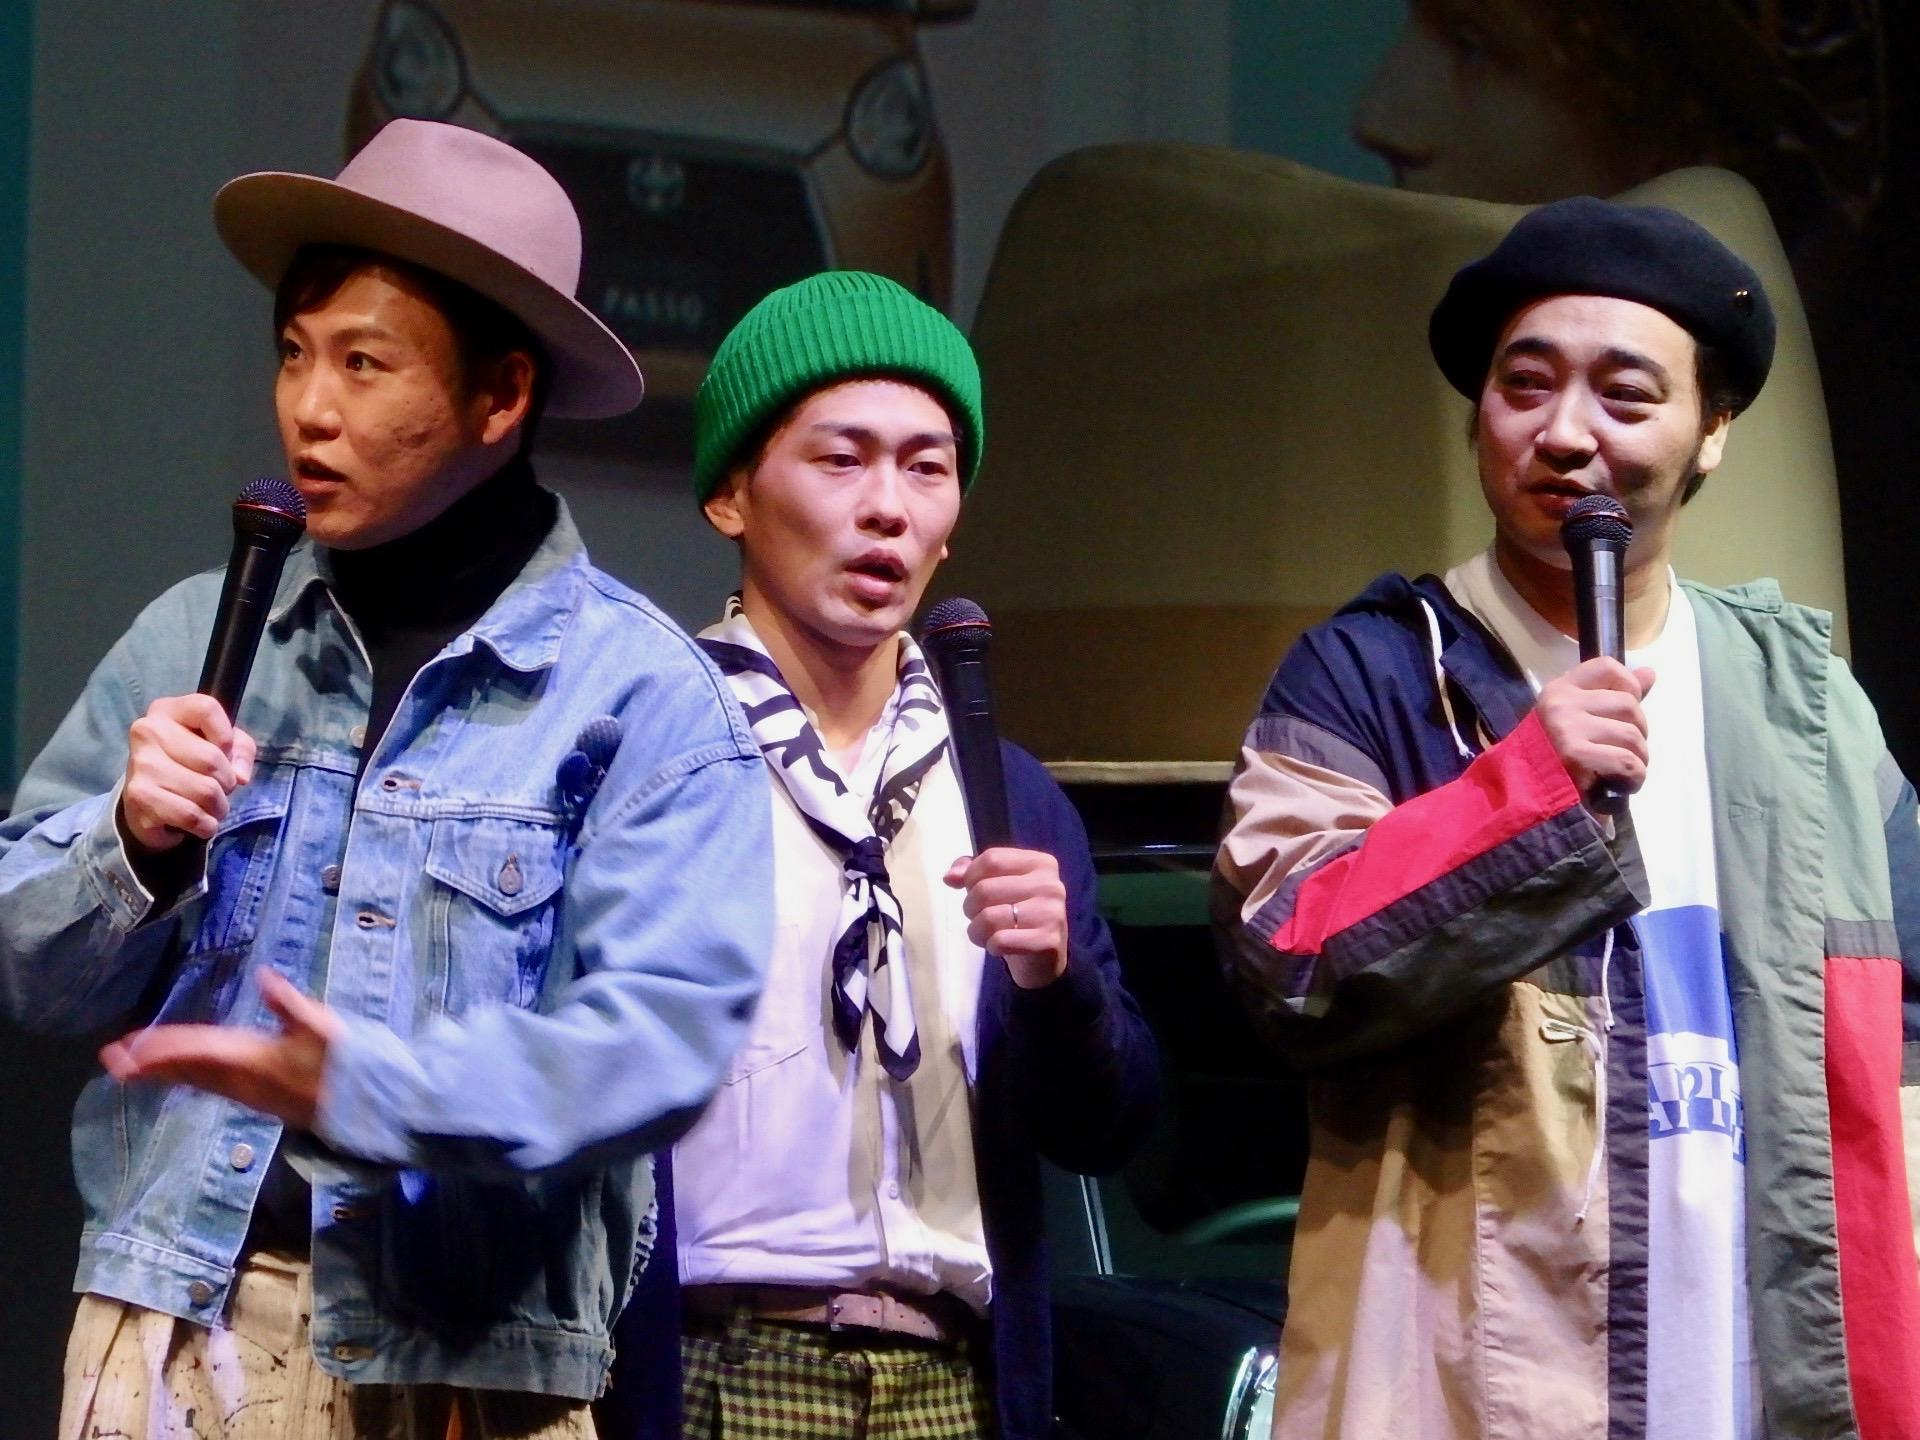 http://news.yoshimoto.co.jp/20181011035454-4c0f4570cf00a48fe7b9e3a1b58f10491275f06a.jpg